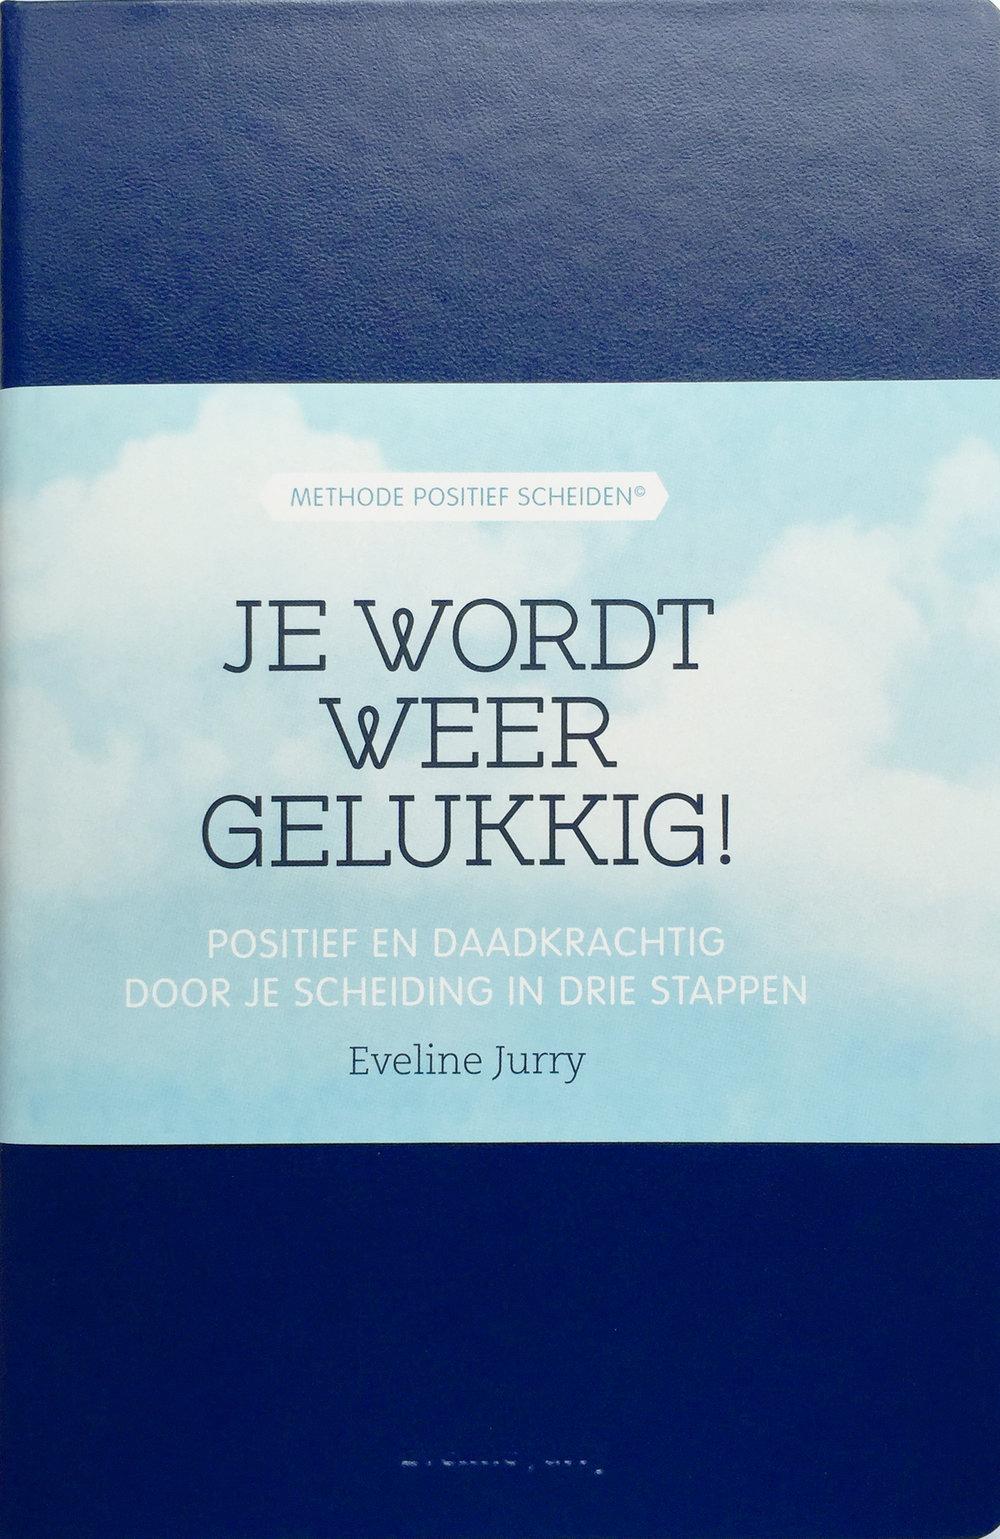 JWWG_small book.jpg